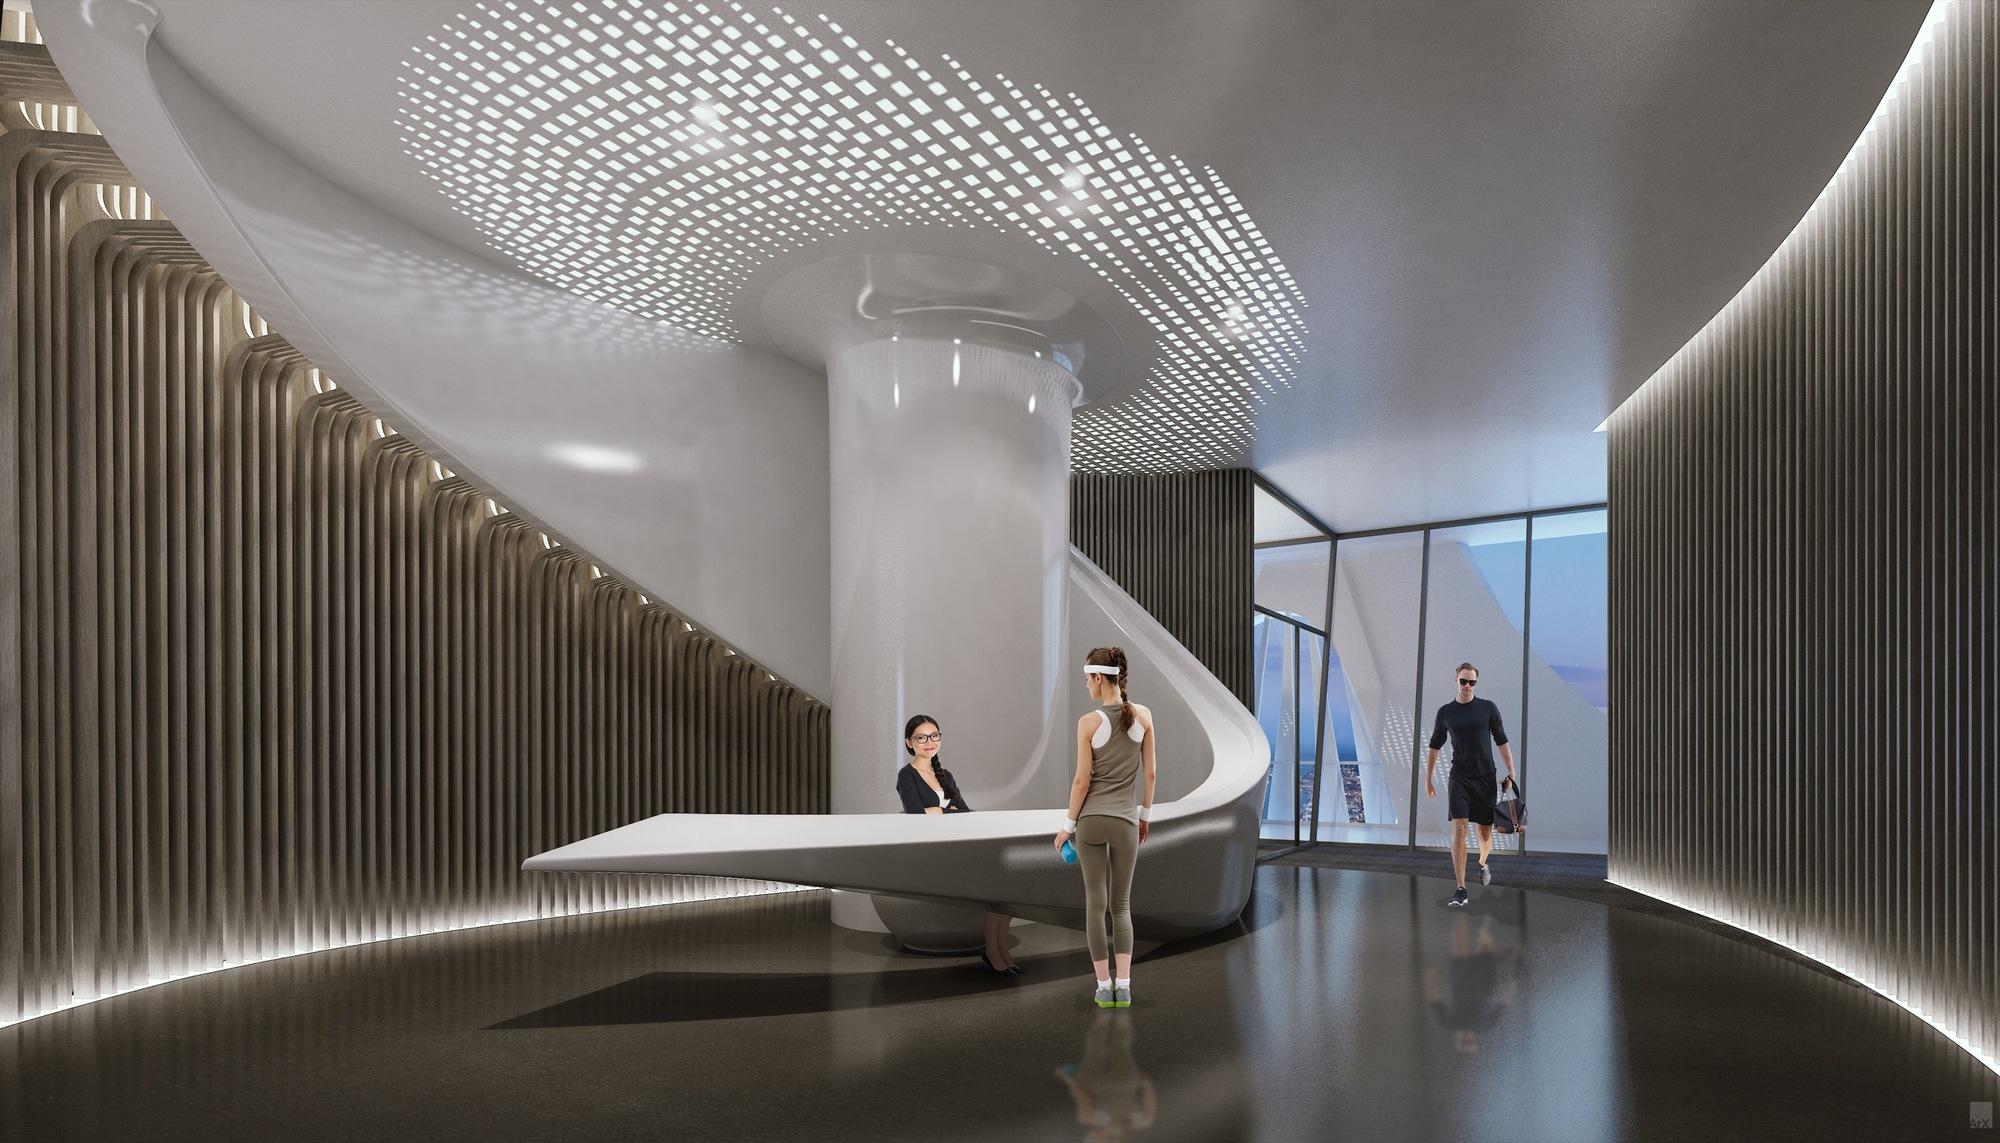 Structural Design Zaha Hadid' 1000 Museum